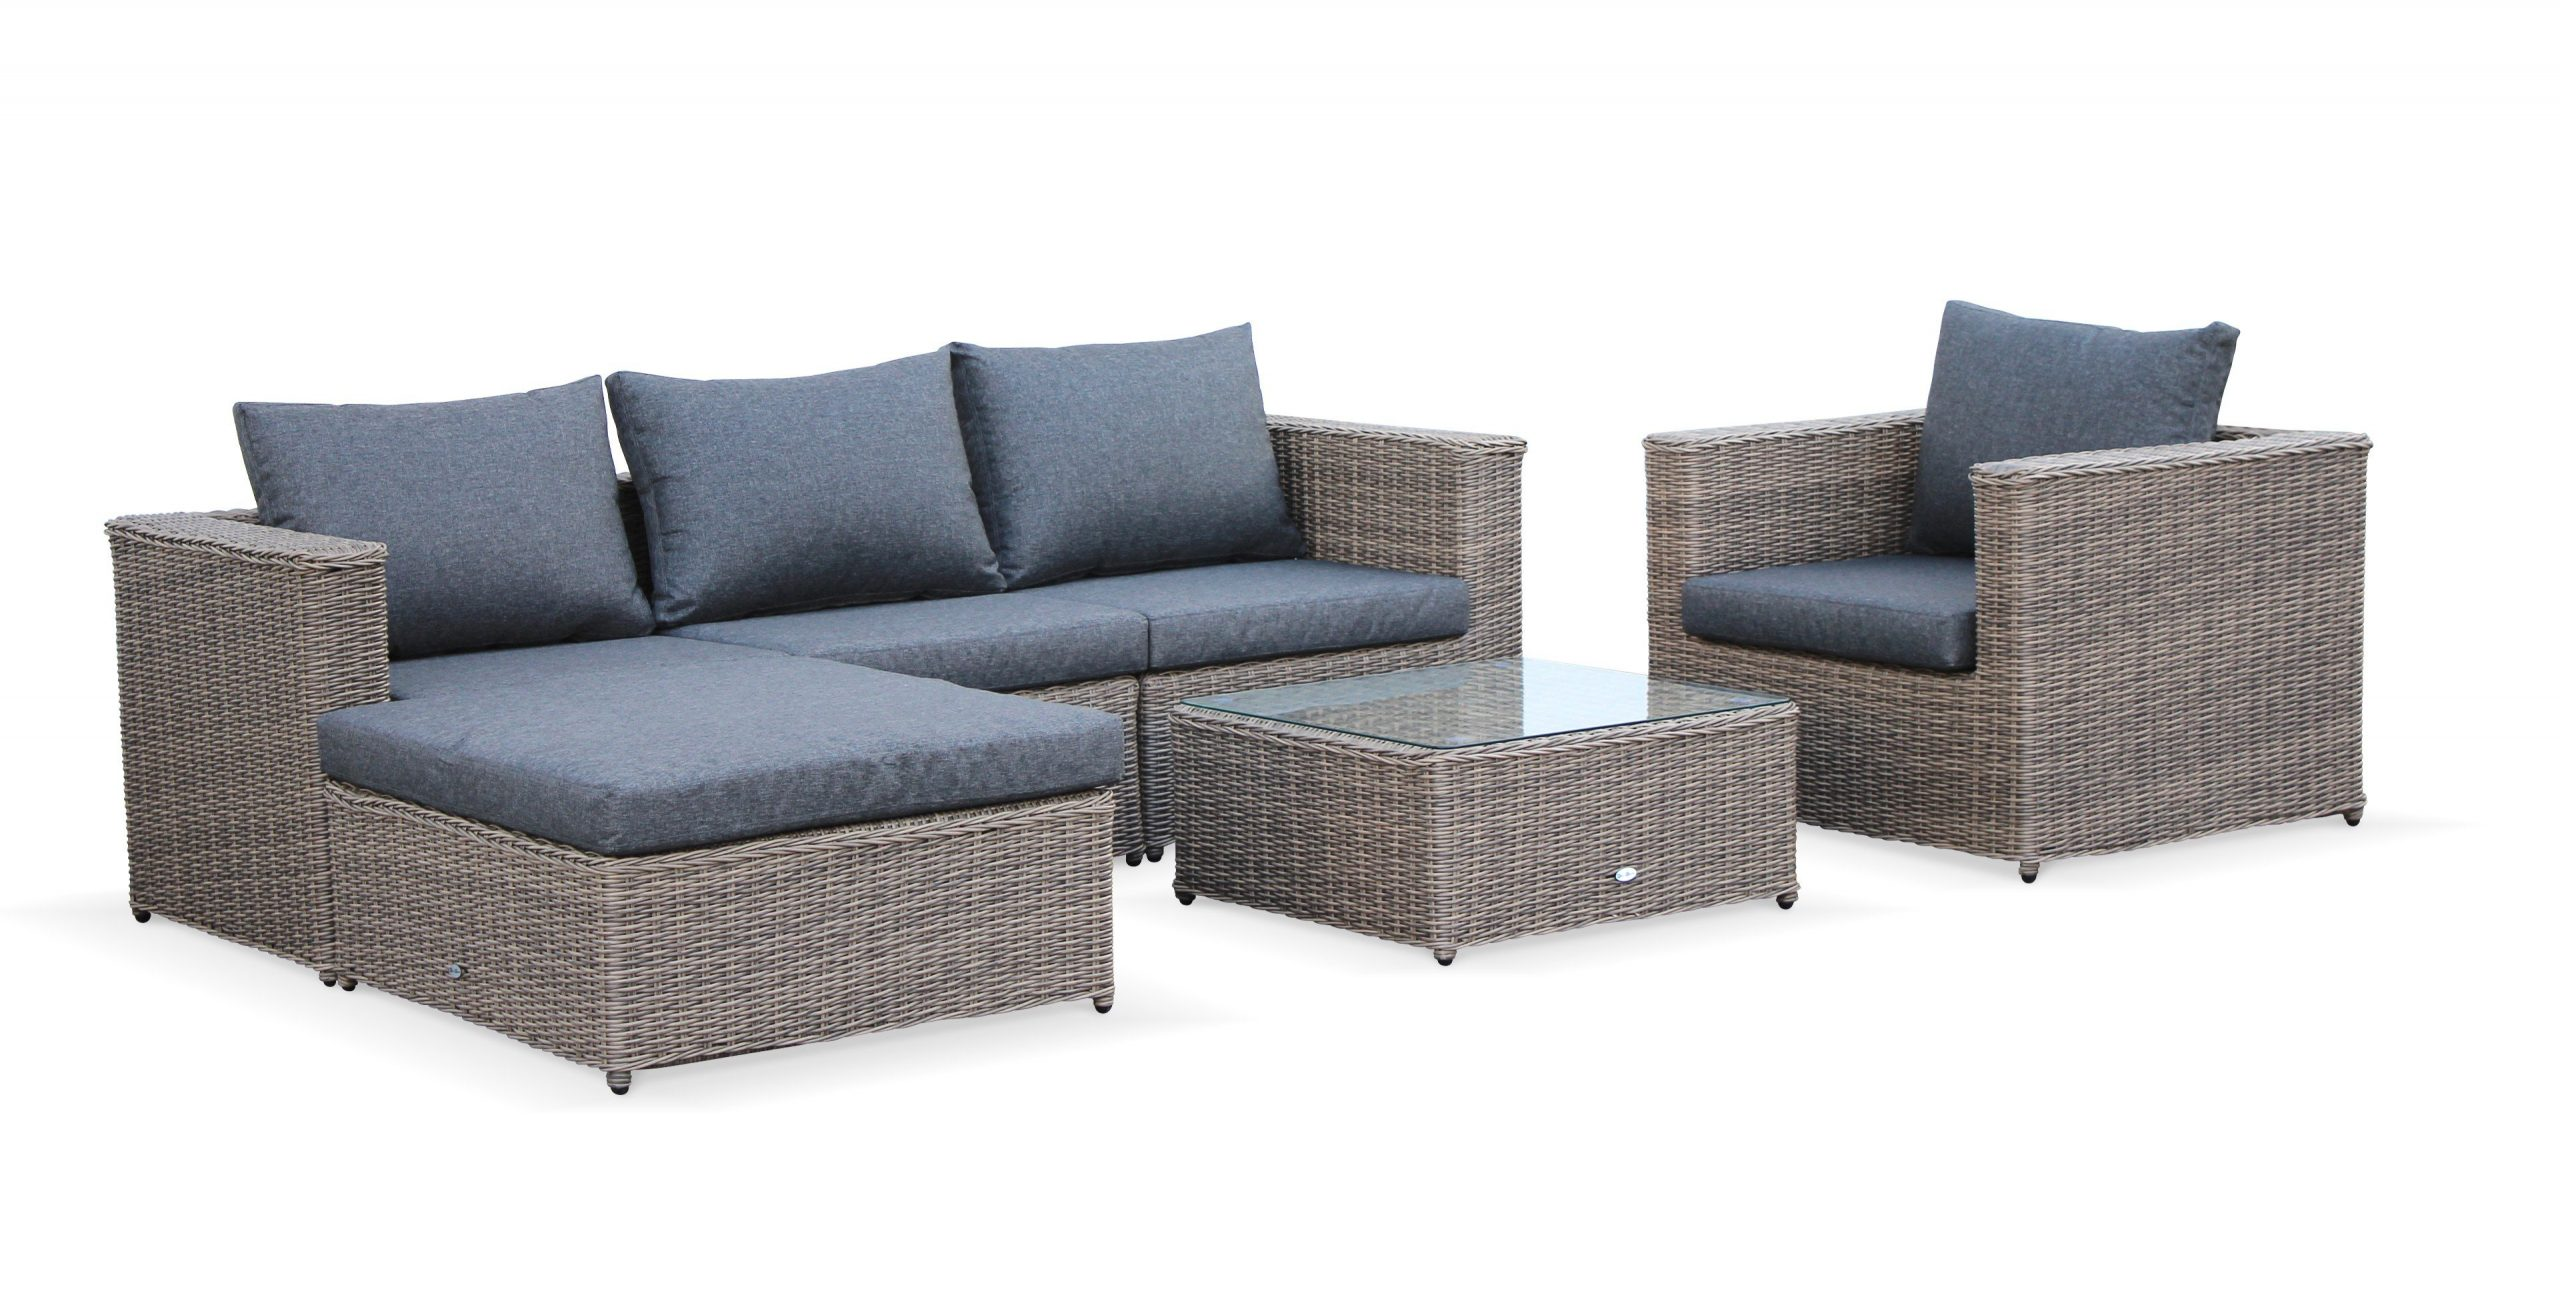 7 - Buy Product On Ningbo Stella Home Co., Ltd. avec Salon De Jardin Polywood